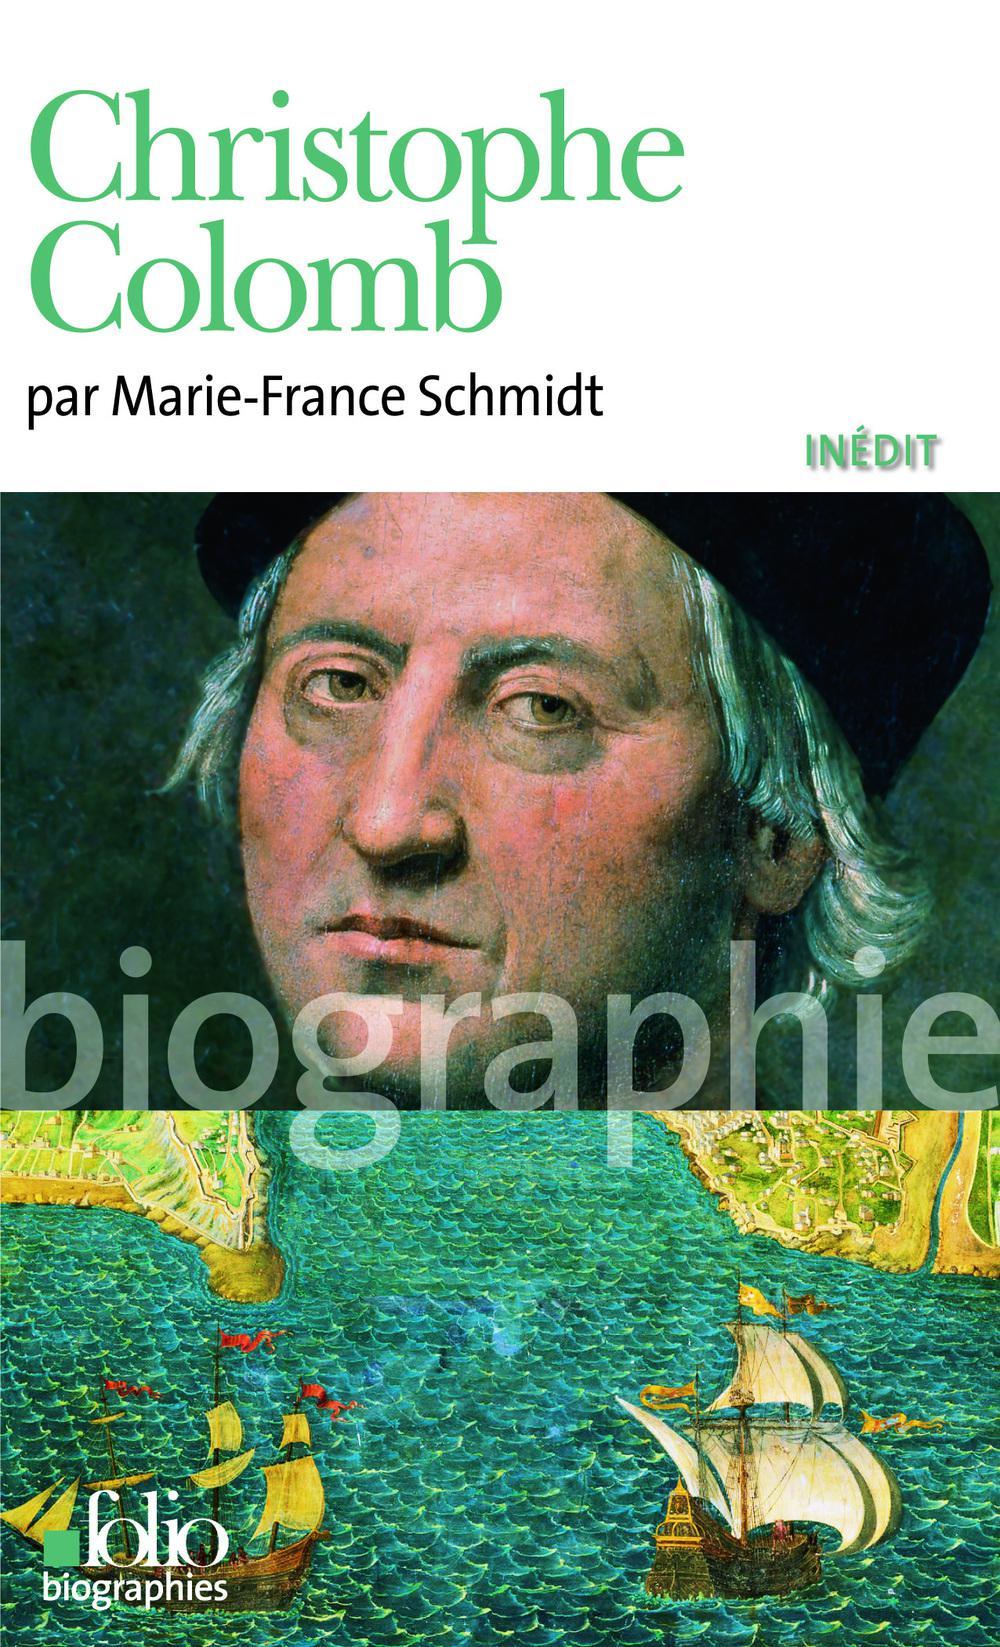 Christophe Colomb